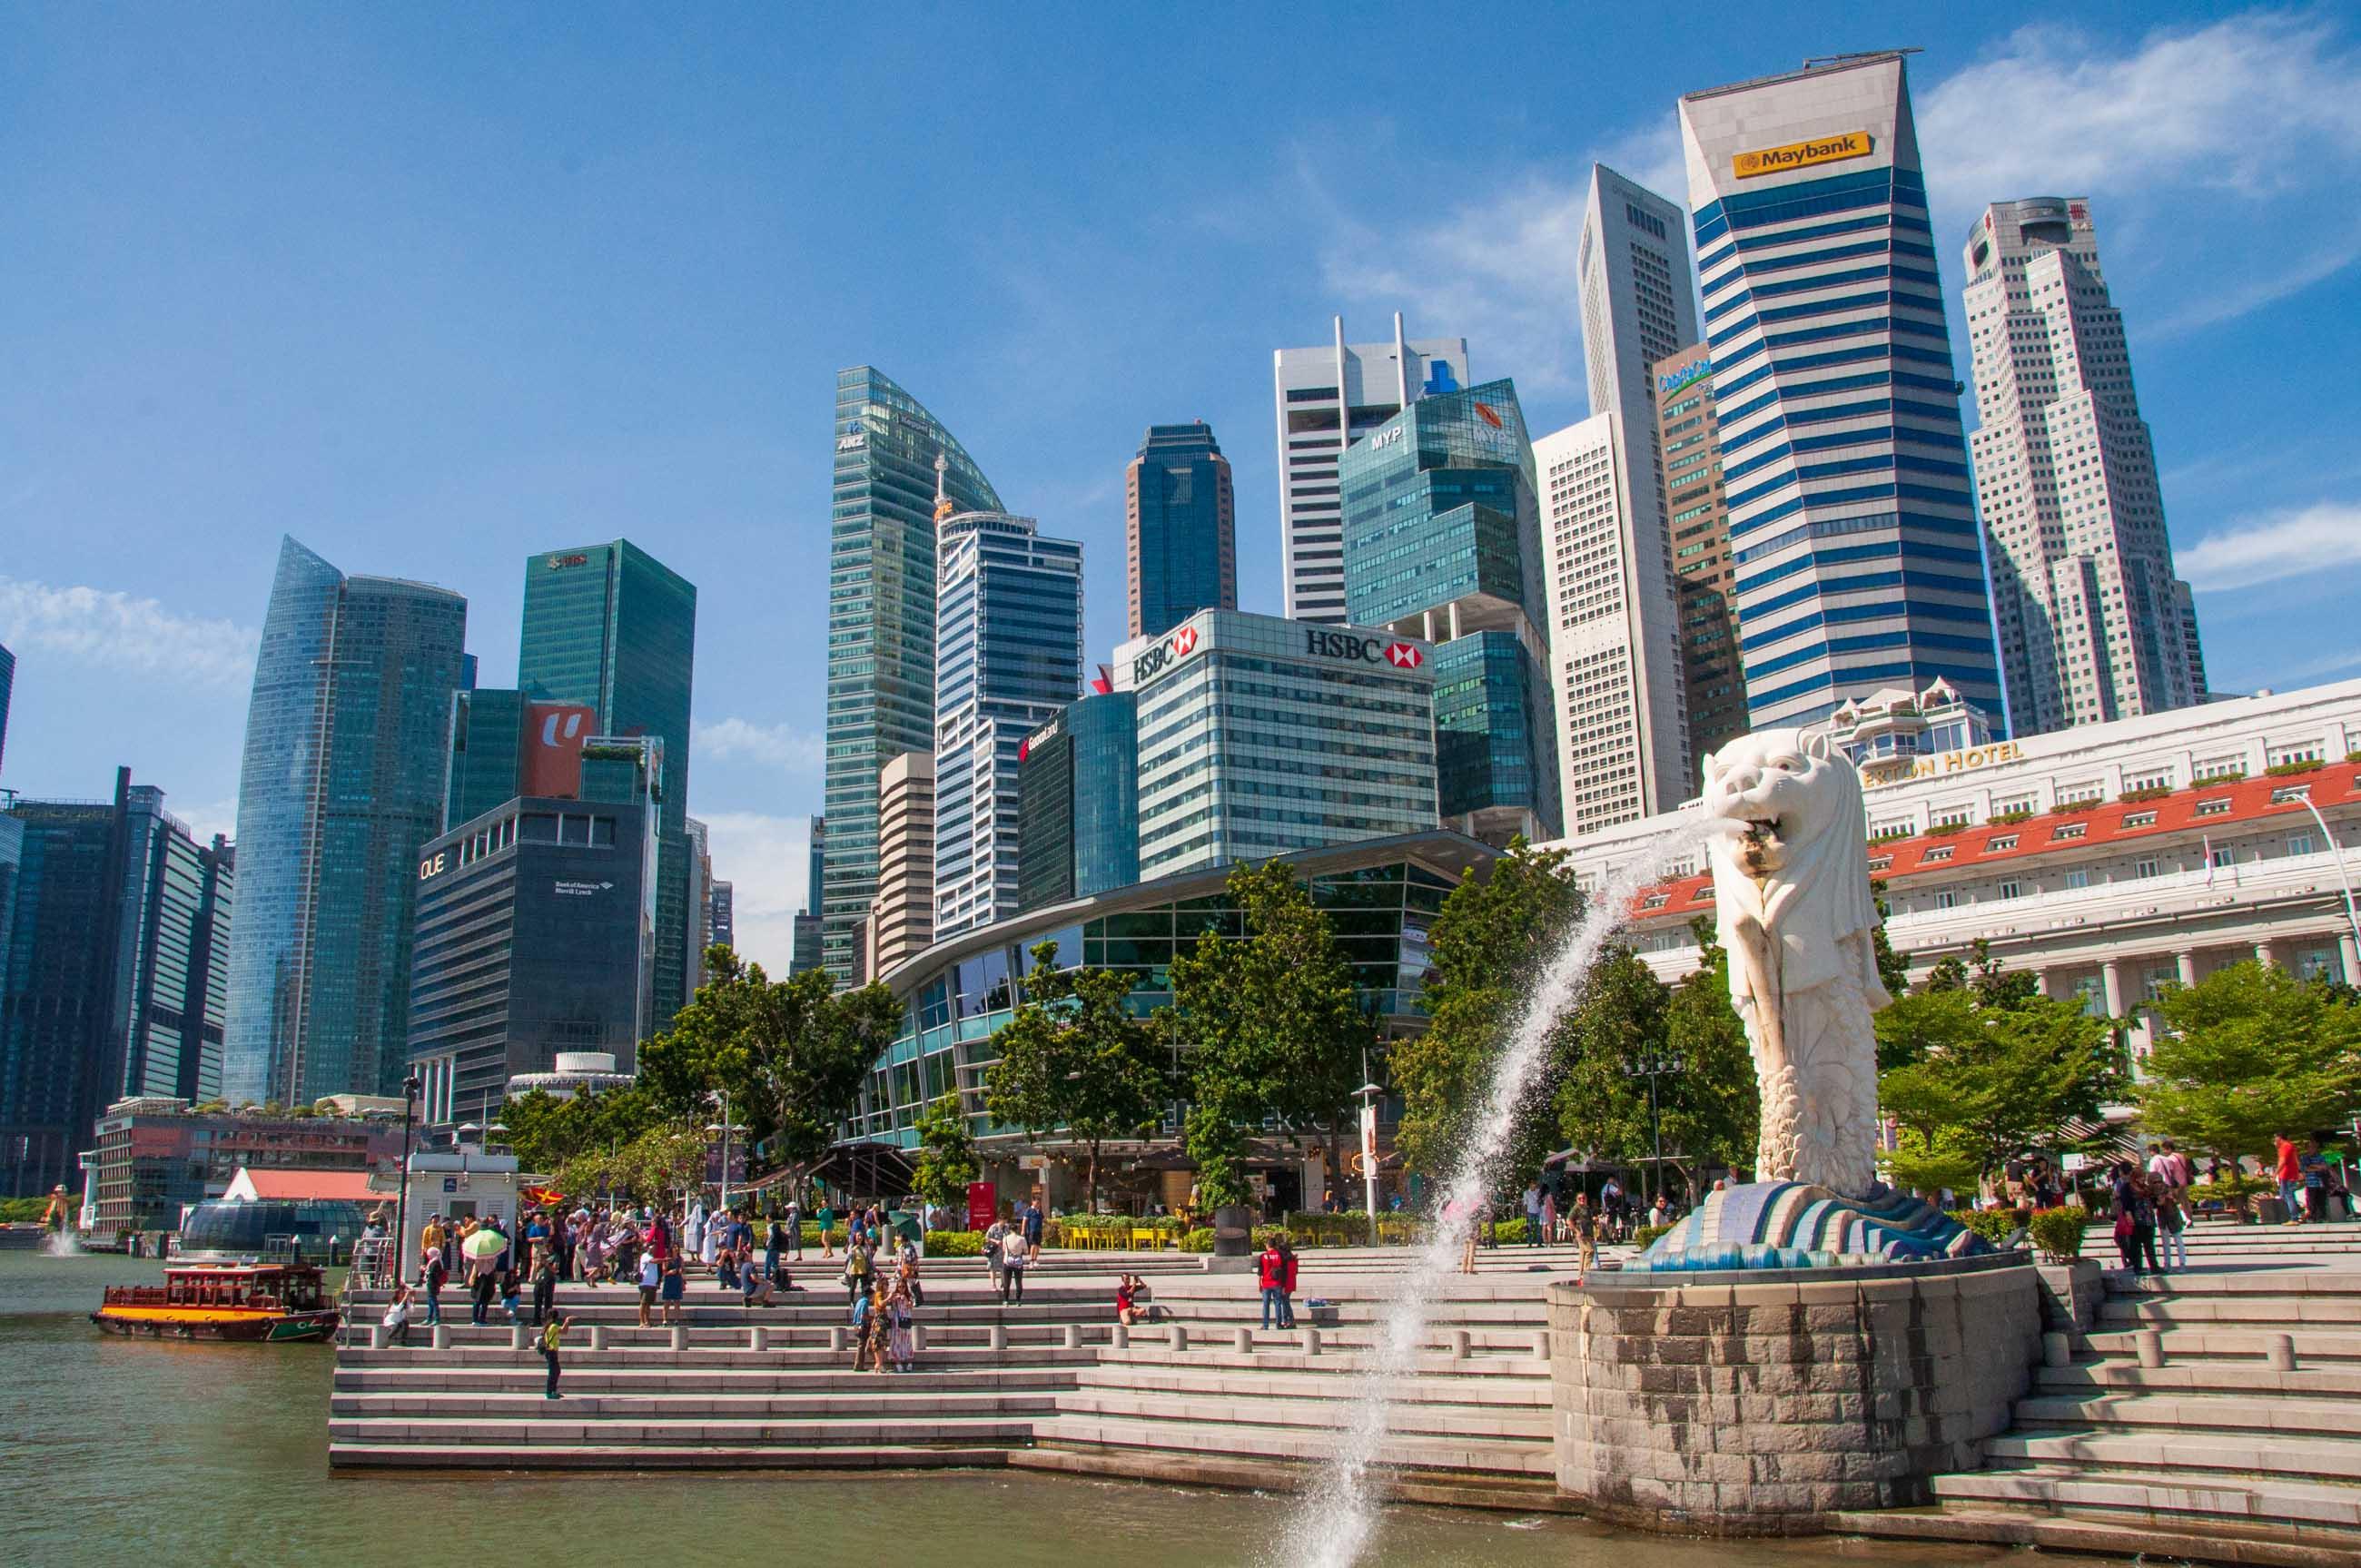 https://bubo.sk/uploads/galleries/5060/tomaskubus_singapur_tms_downtown.jpg